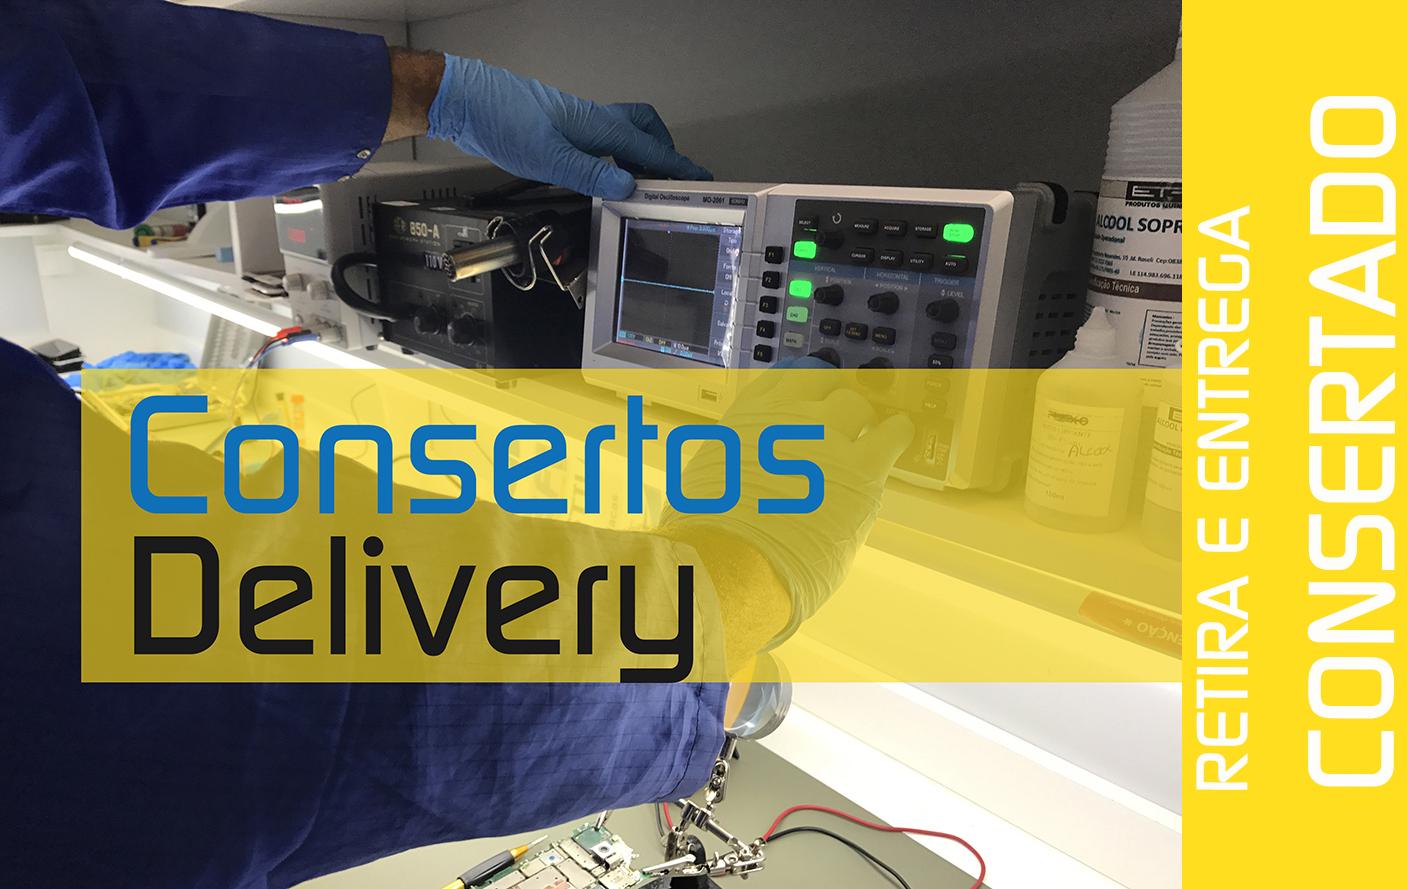 Consertos Delivery - Consertar Celular em Domicílio -